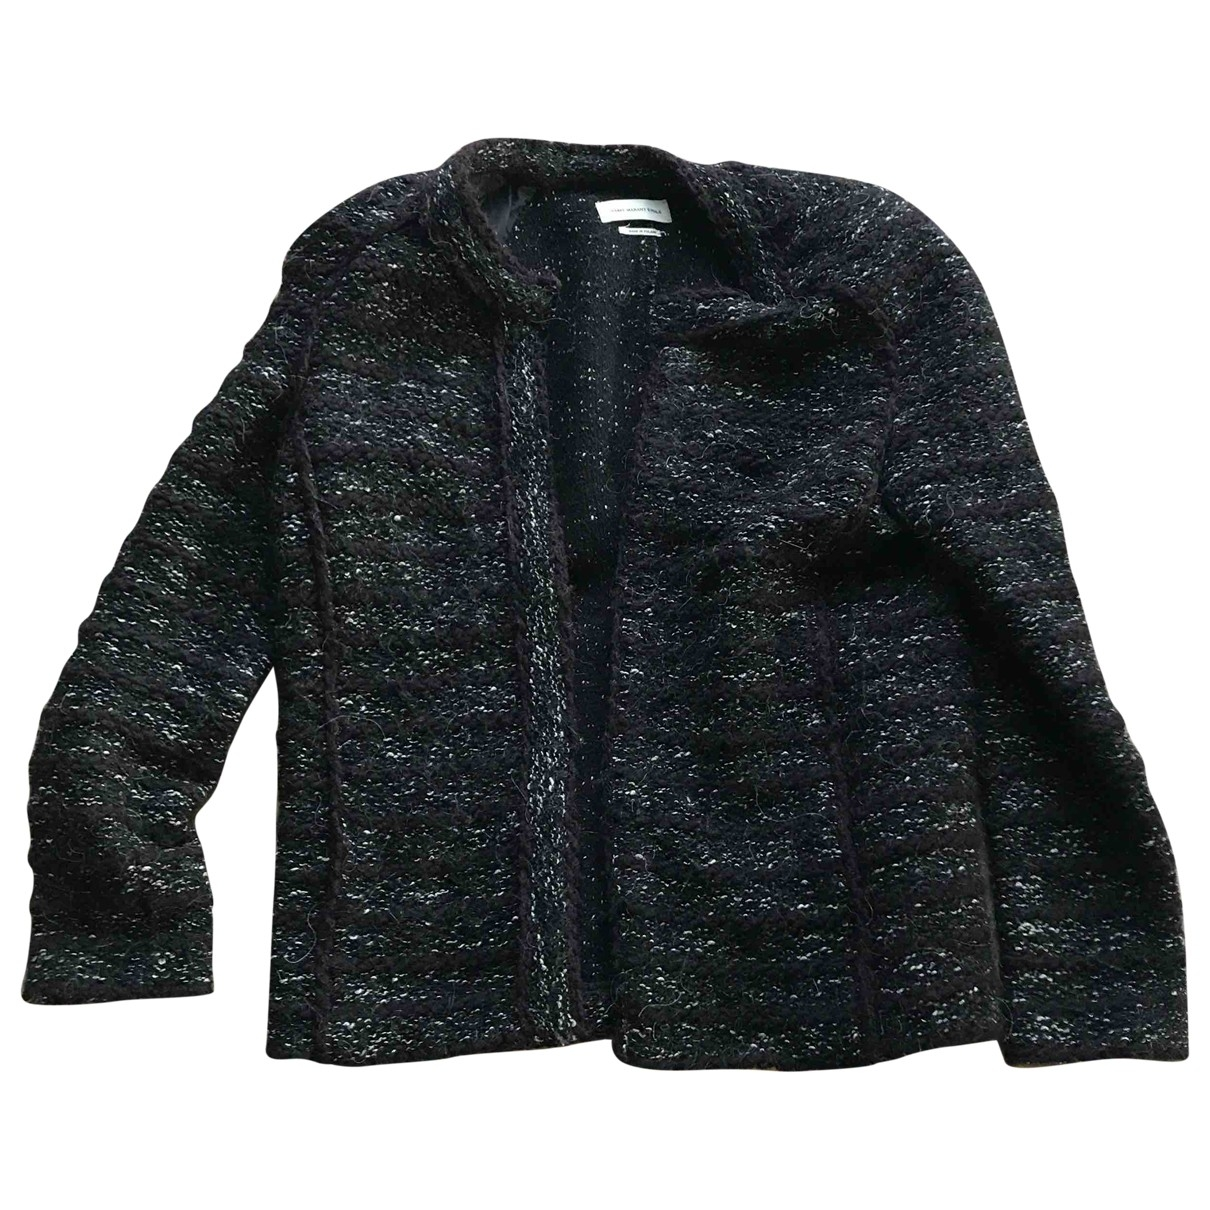 Isabel Marant Etoile \N Black Wool jacket for Women 44 FR